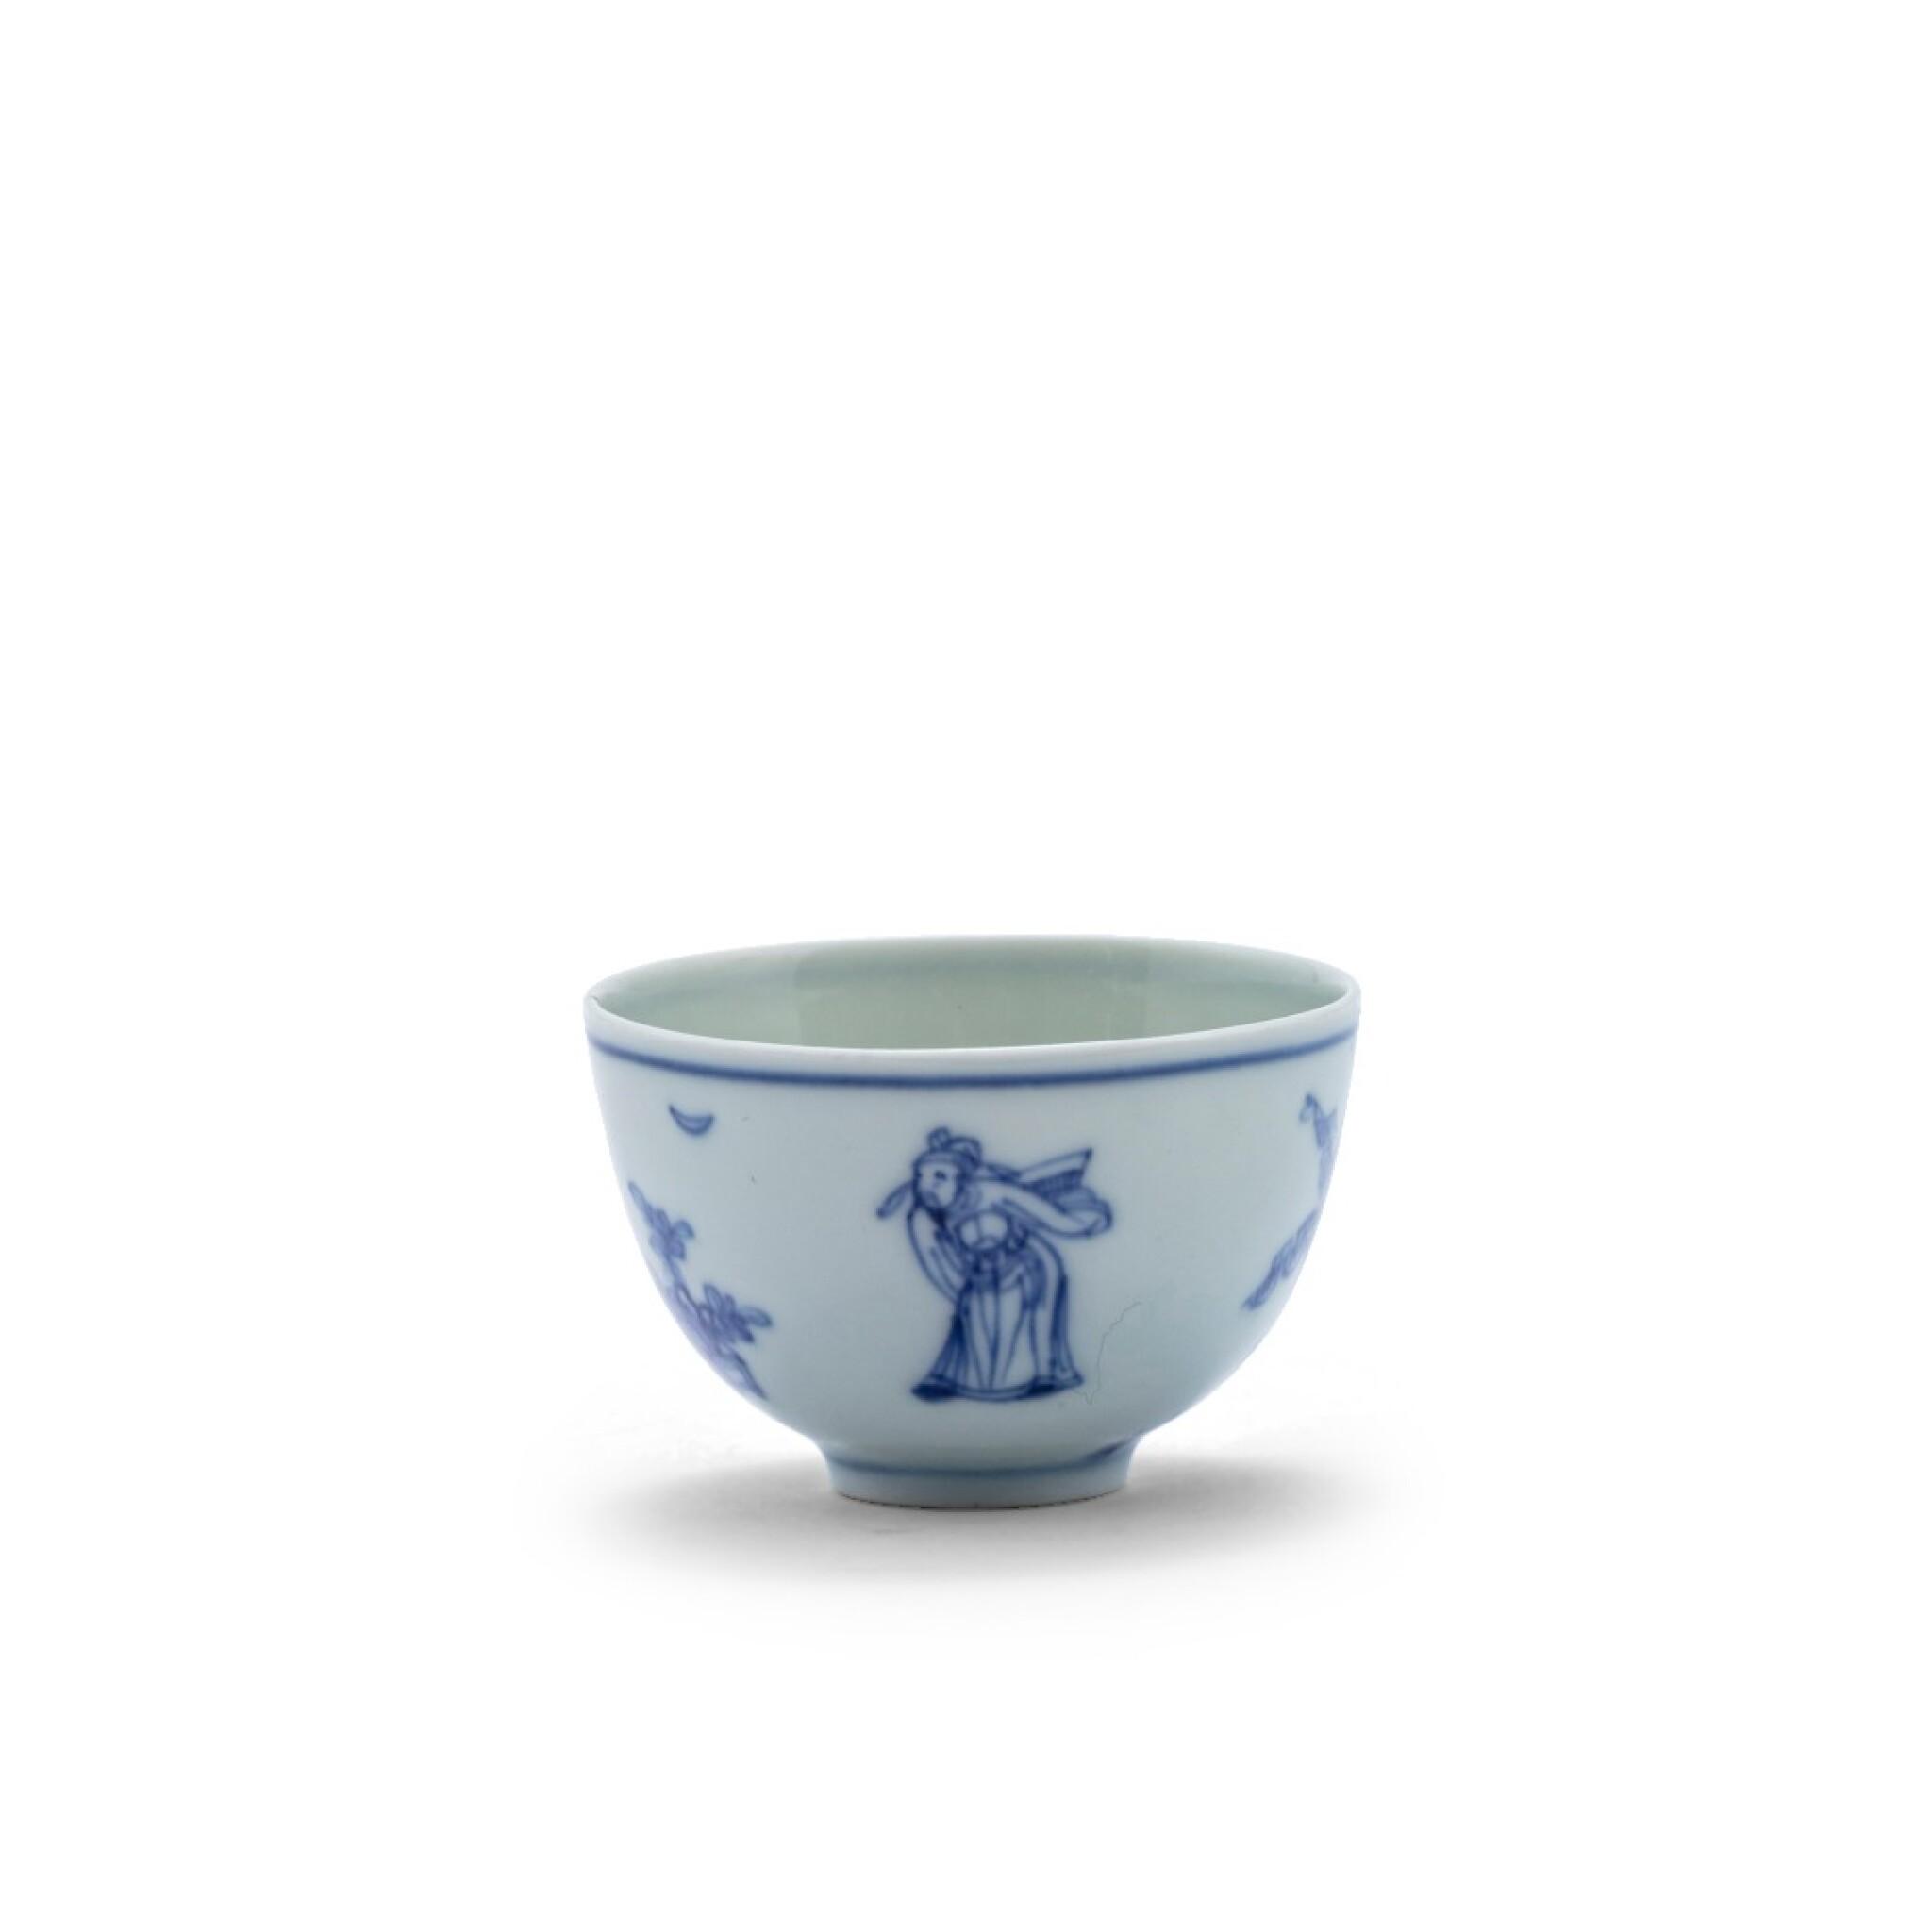 View 1 of Lot 20. Petite coupe en porcelaine bleu blanc Dynastie Qing, époque Kangxi | 清康熙 青花人物故事紋小盃  《大明成化年製》仿款 | A blue and white 'scholar' cup, Qing Dynasty, Kangxi period.